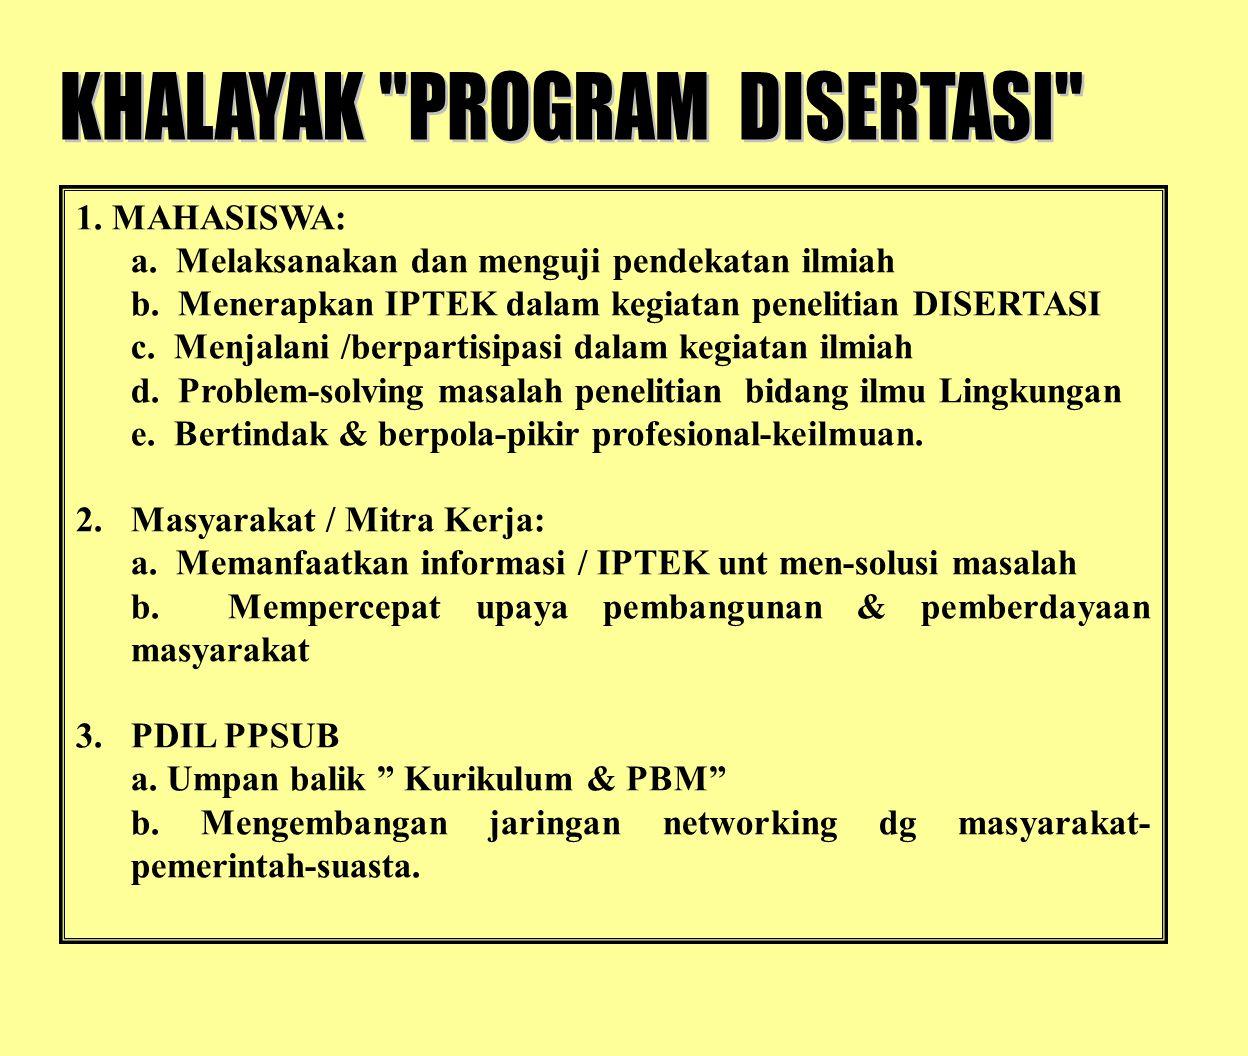 1. MAHASISWA: a. Melaksanakan dan menguji pendekatan ilmiah b. Menerapkan IPTEK dalam kegiatan penelitian DISERTASI c. Menjalani /berpartisipasi dalam